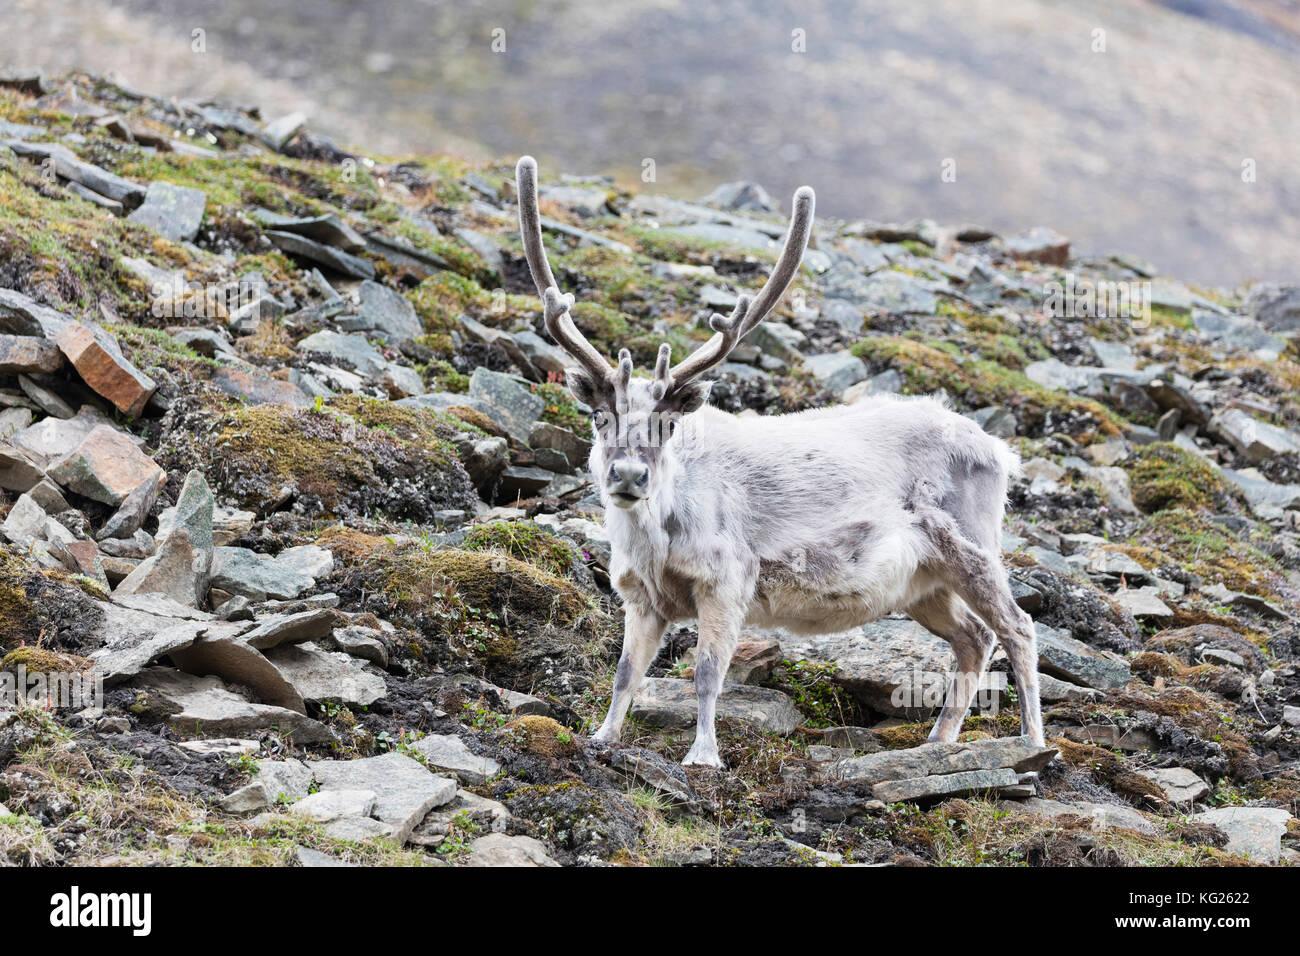 Reindeer (Rangifer tarandus), Spitsbergen, Svalbard, Arctic, Norway, Europe - Stock Image